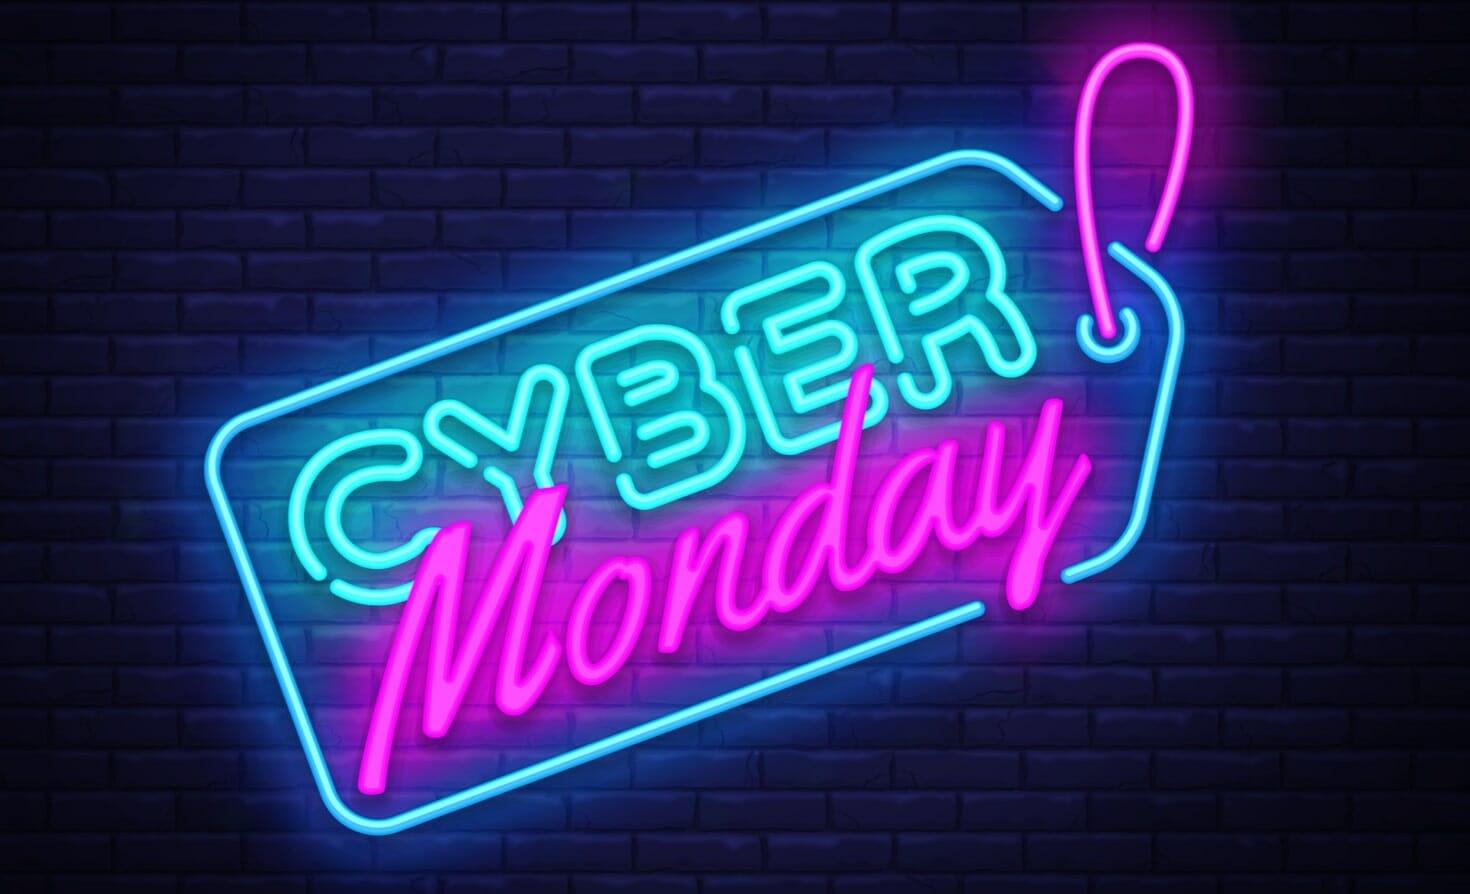 Cyber monday furniture deals